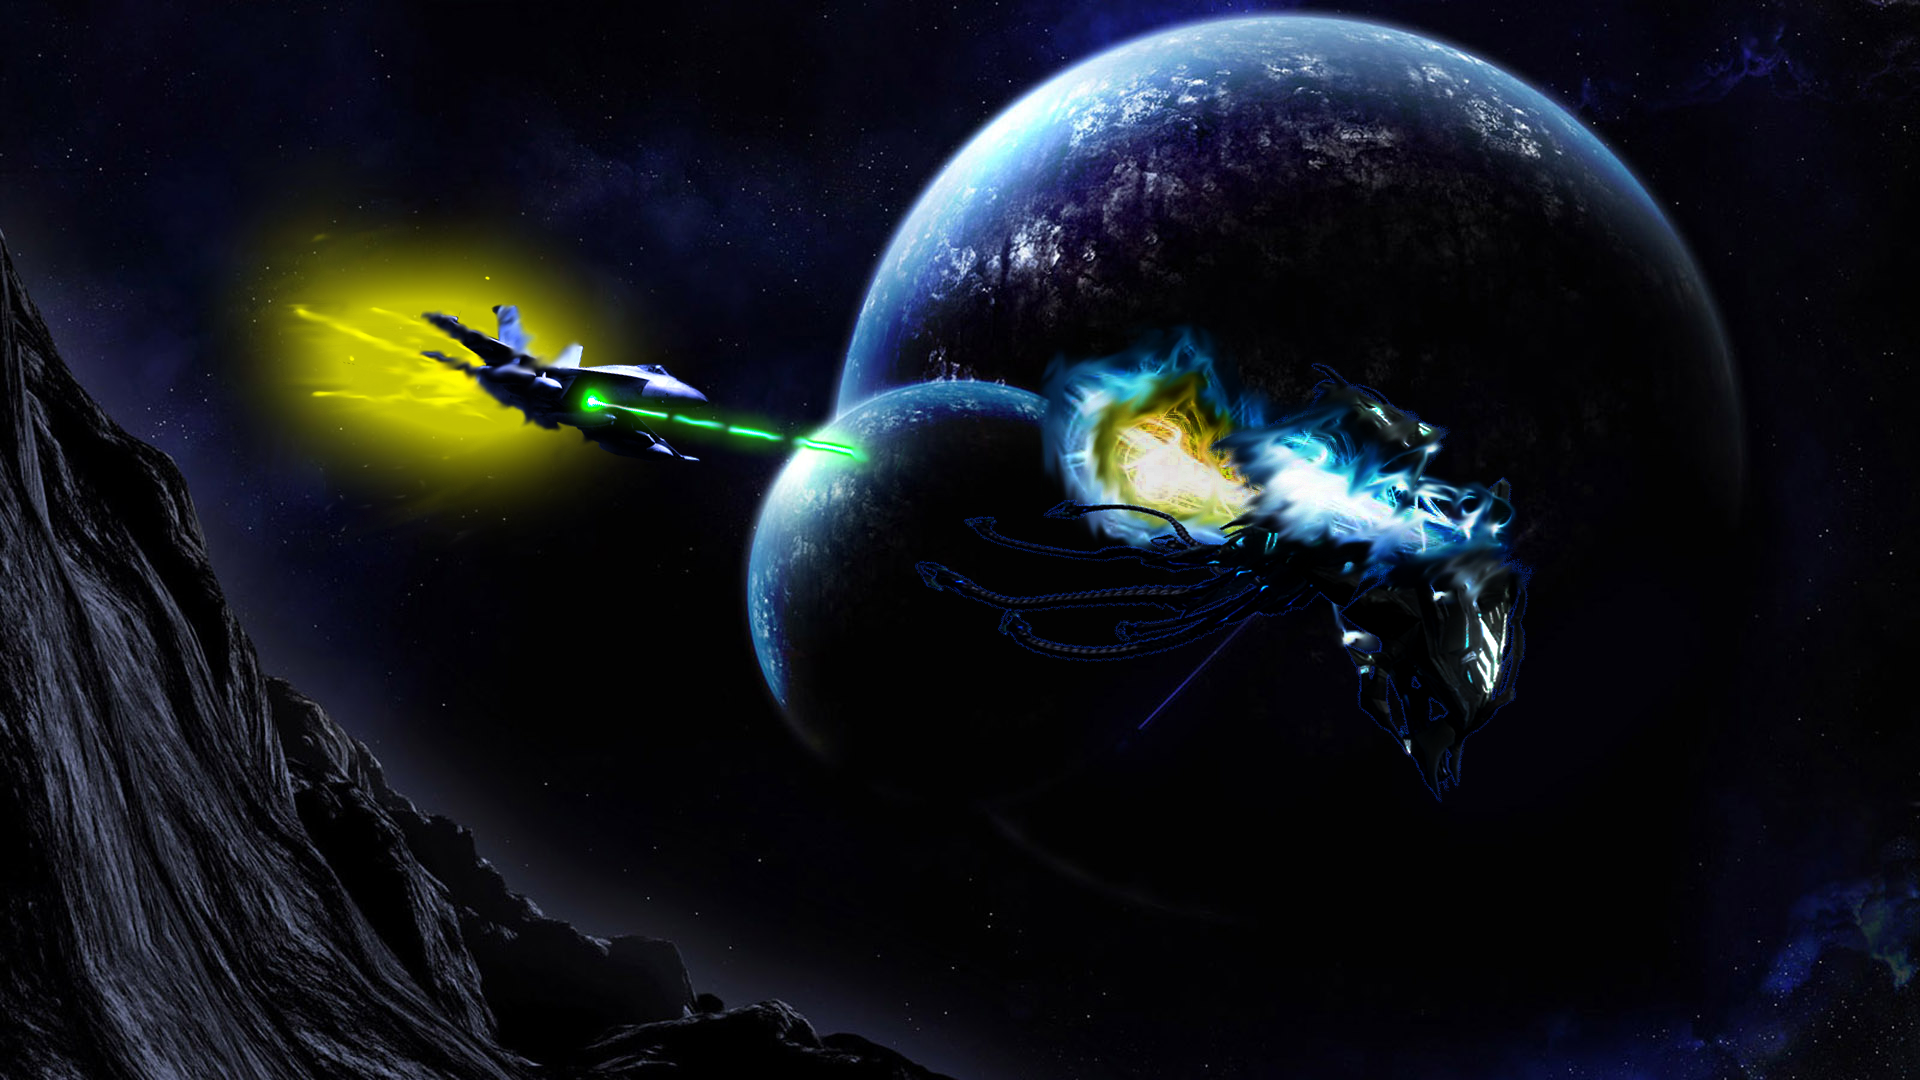 Epic Space Battle Wallpaper Epic Space Battle by